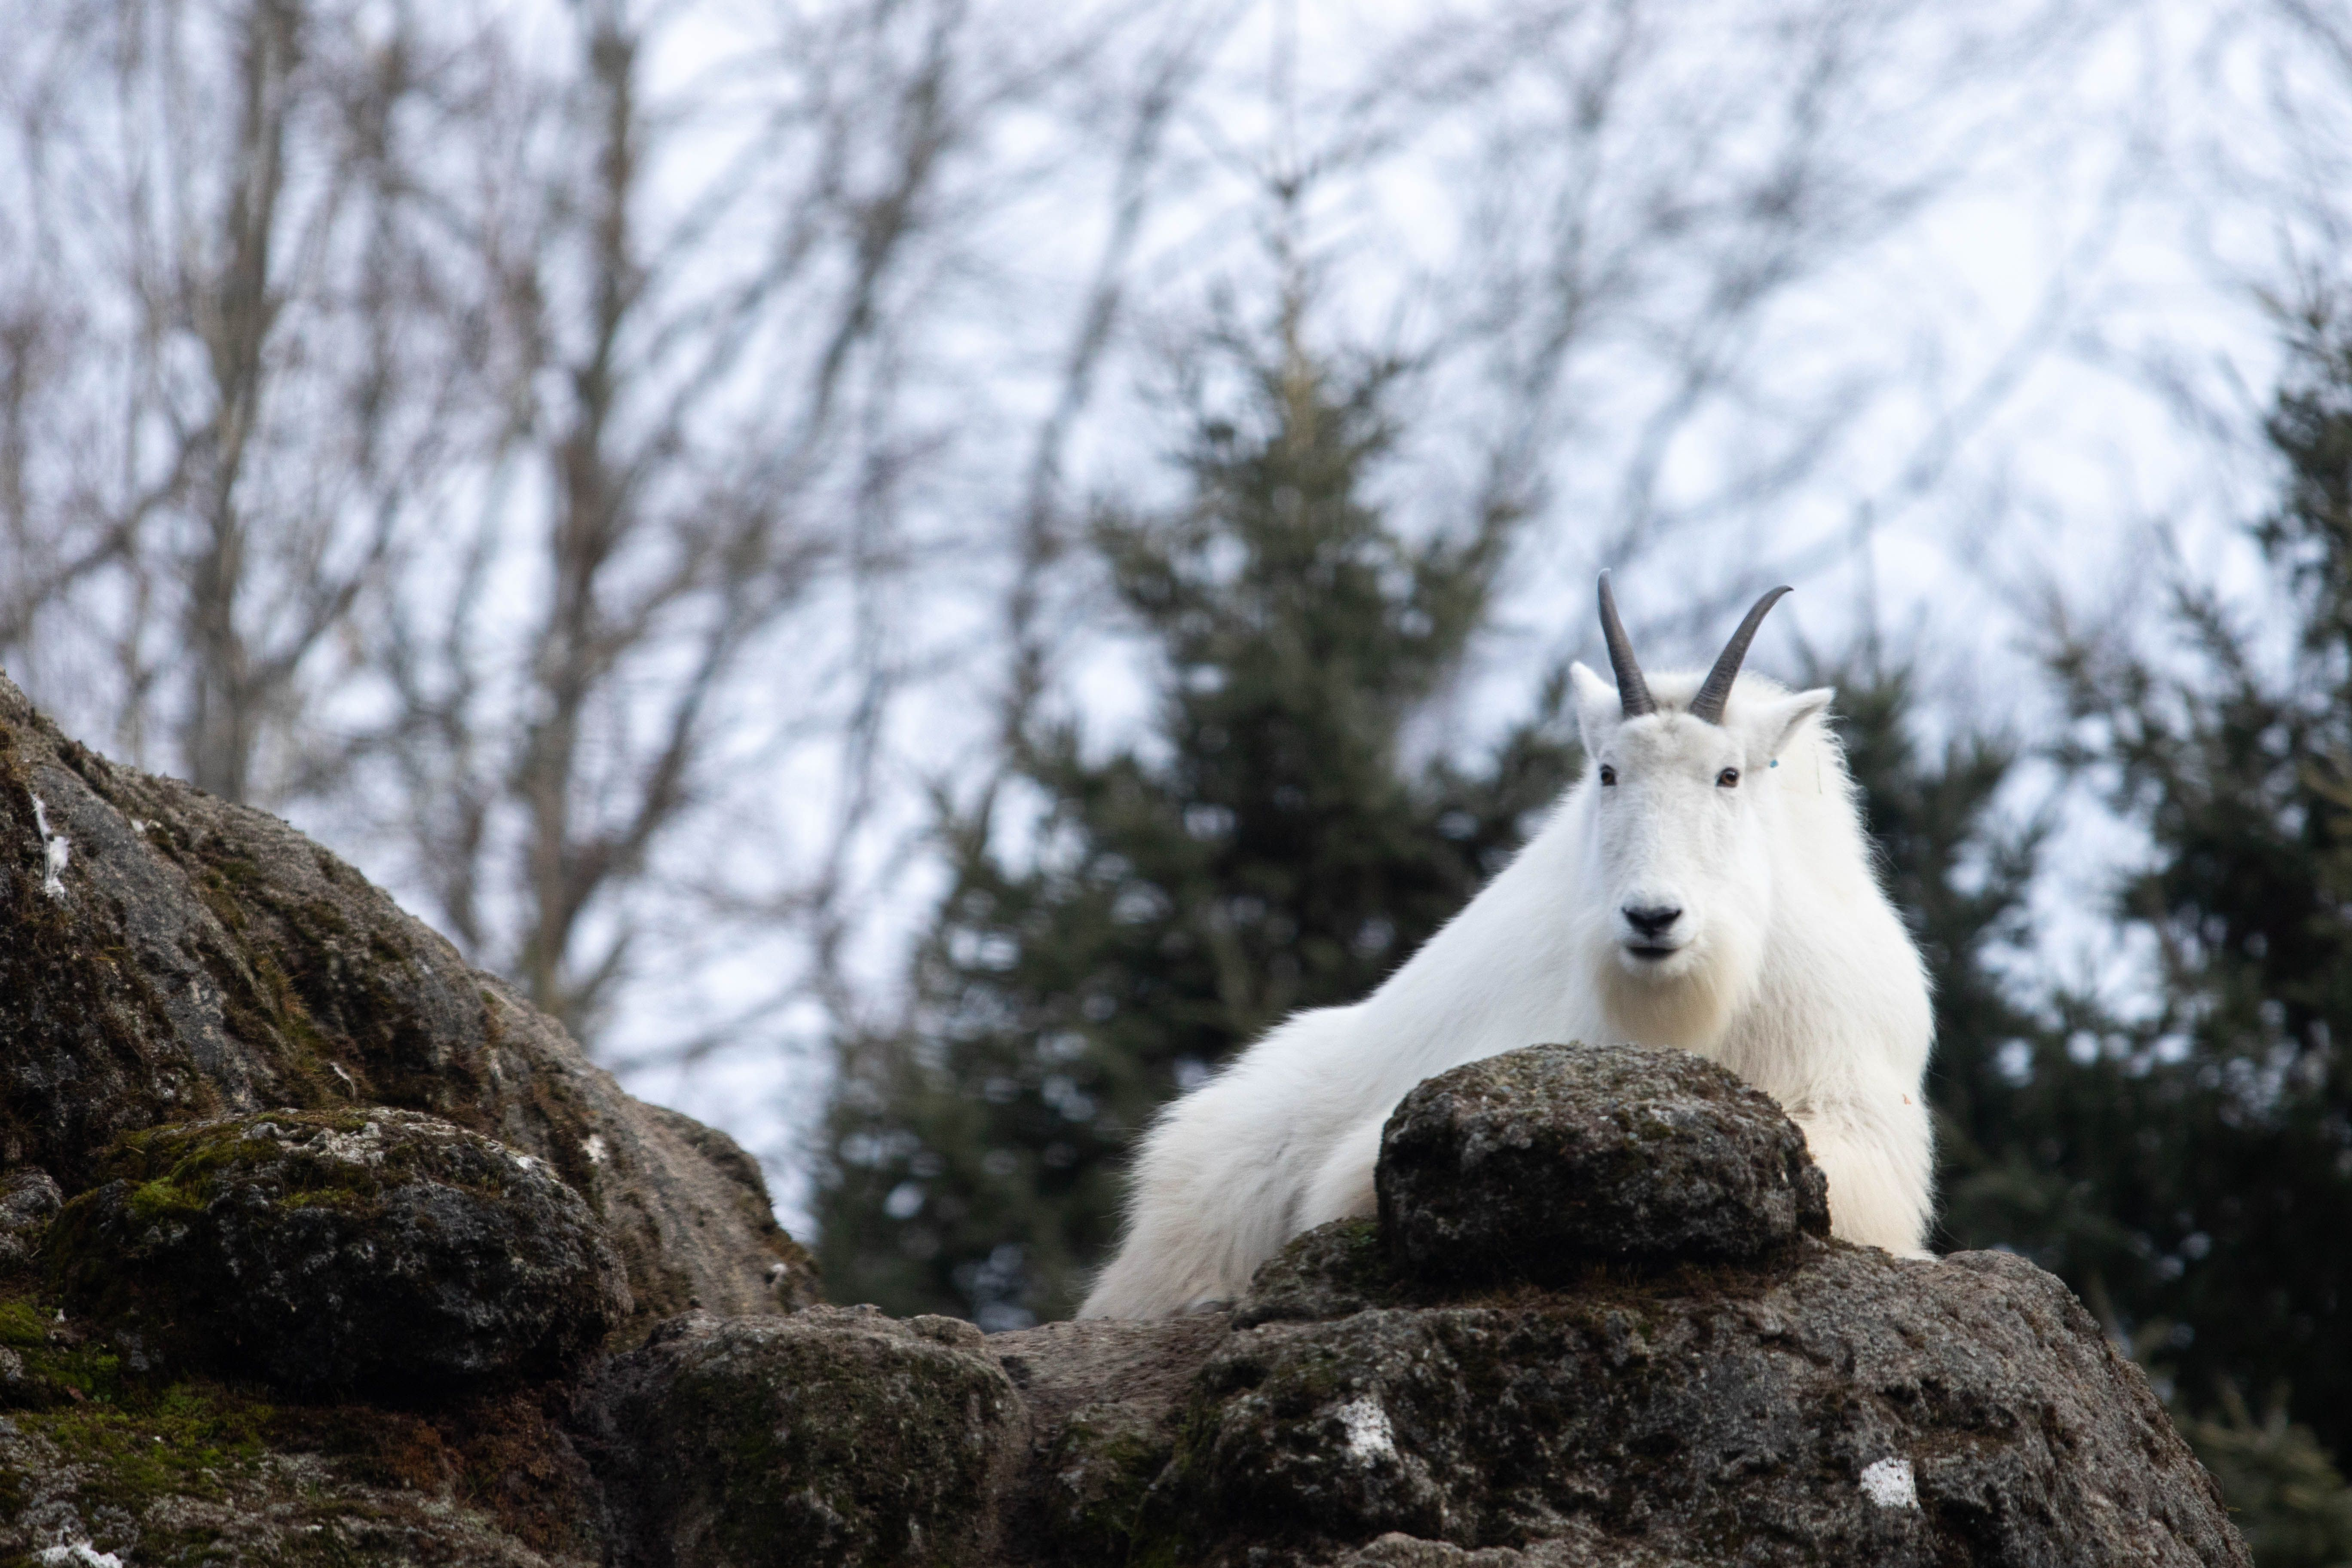 A goat at Woodland Park